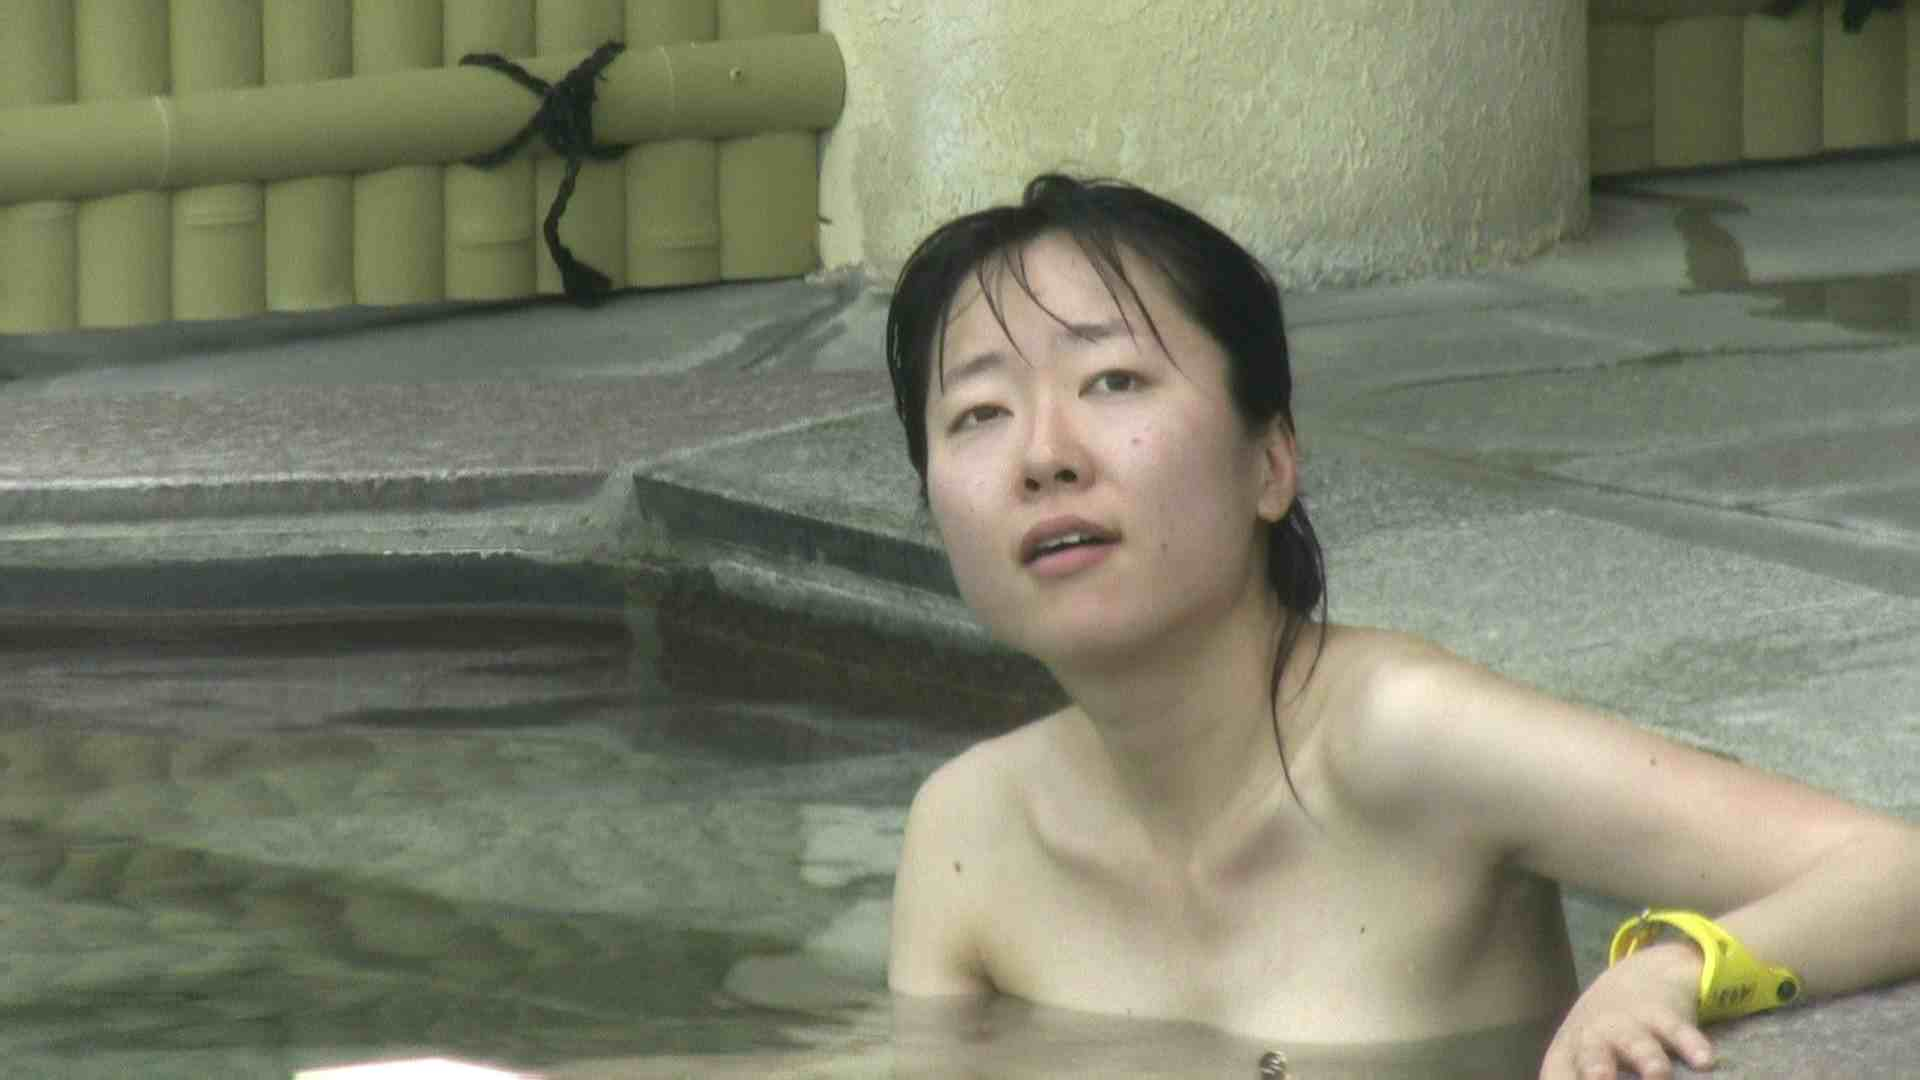 Aquaな露天風呂Vol.667 露天風呂突入 | 美しいOLの裸体  92pic 28